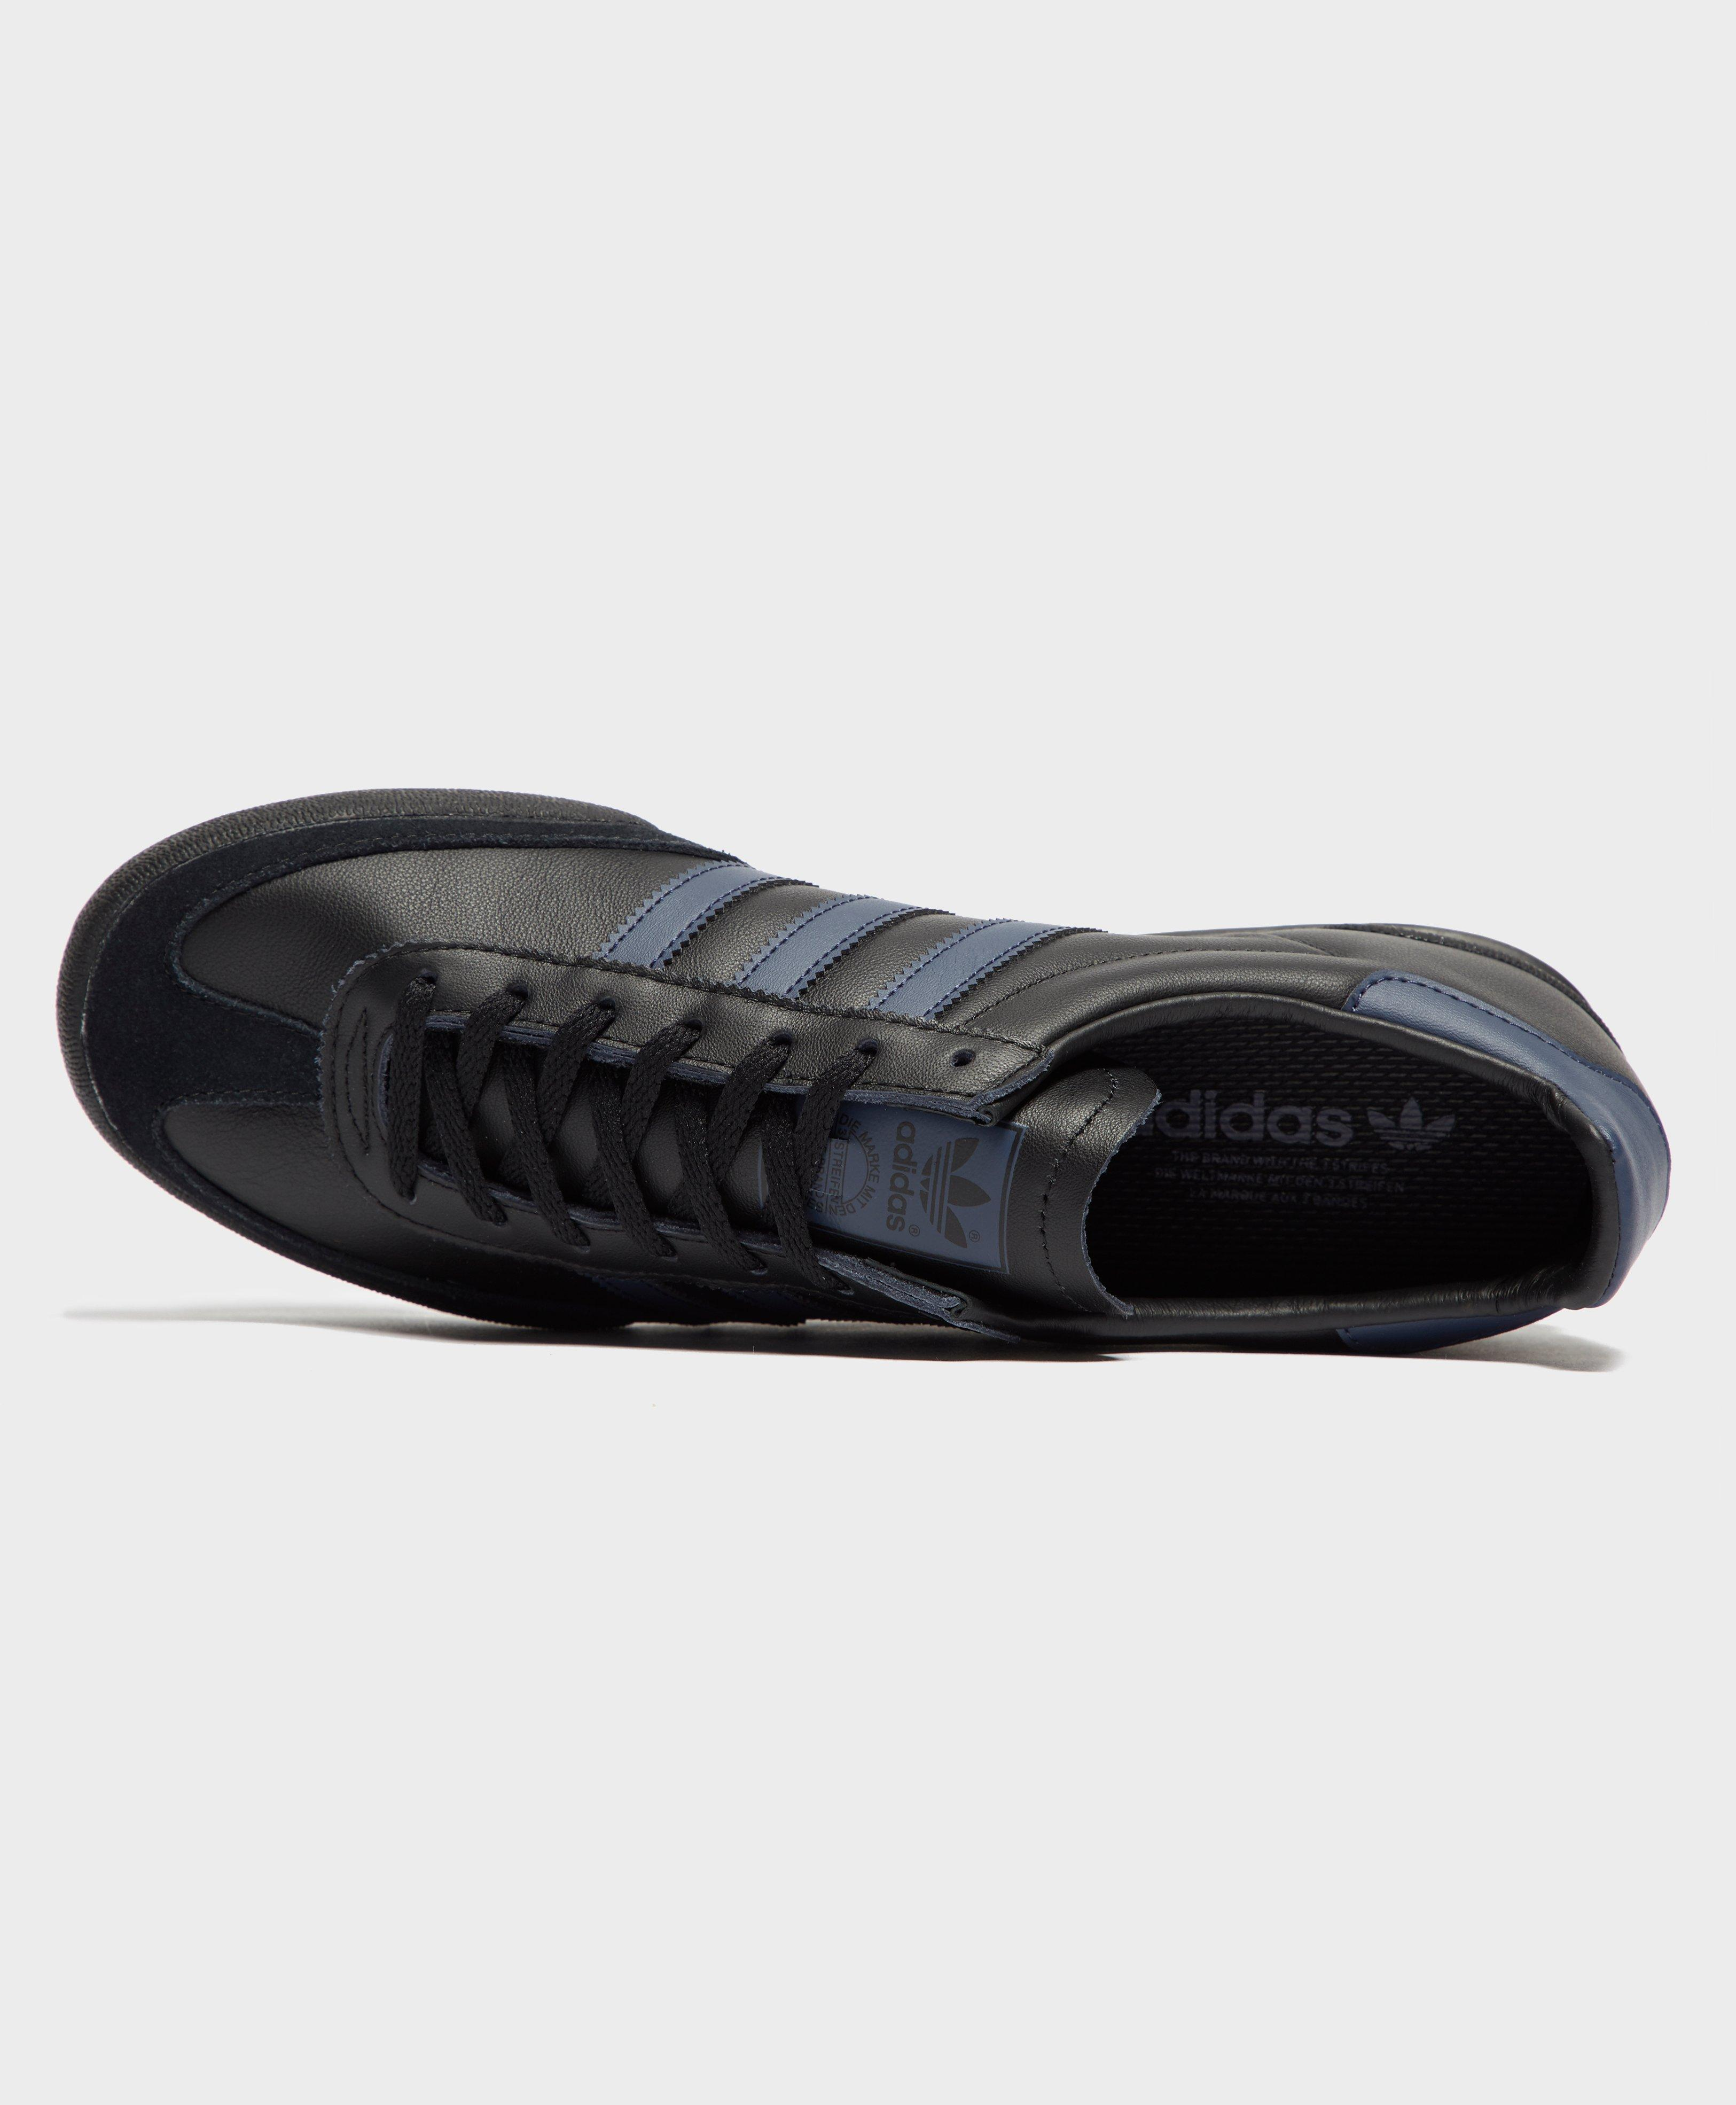 adidas jeans leather black